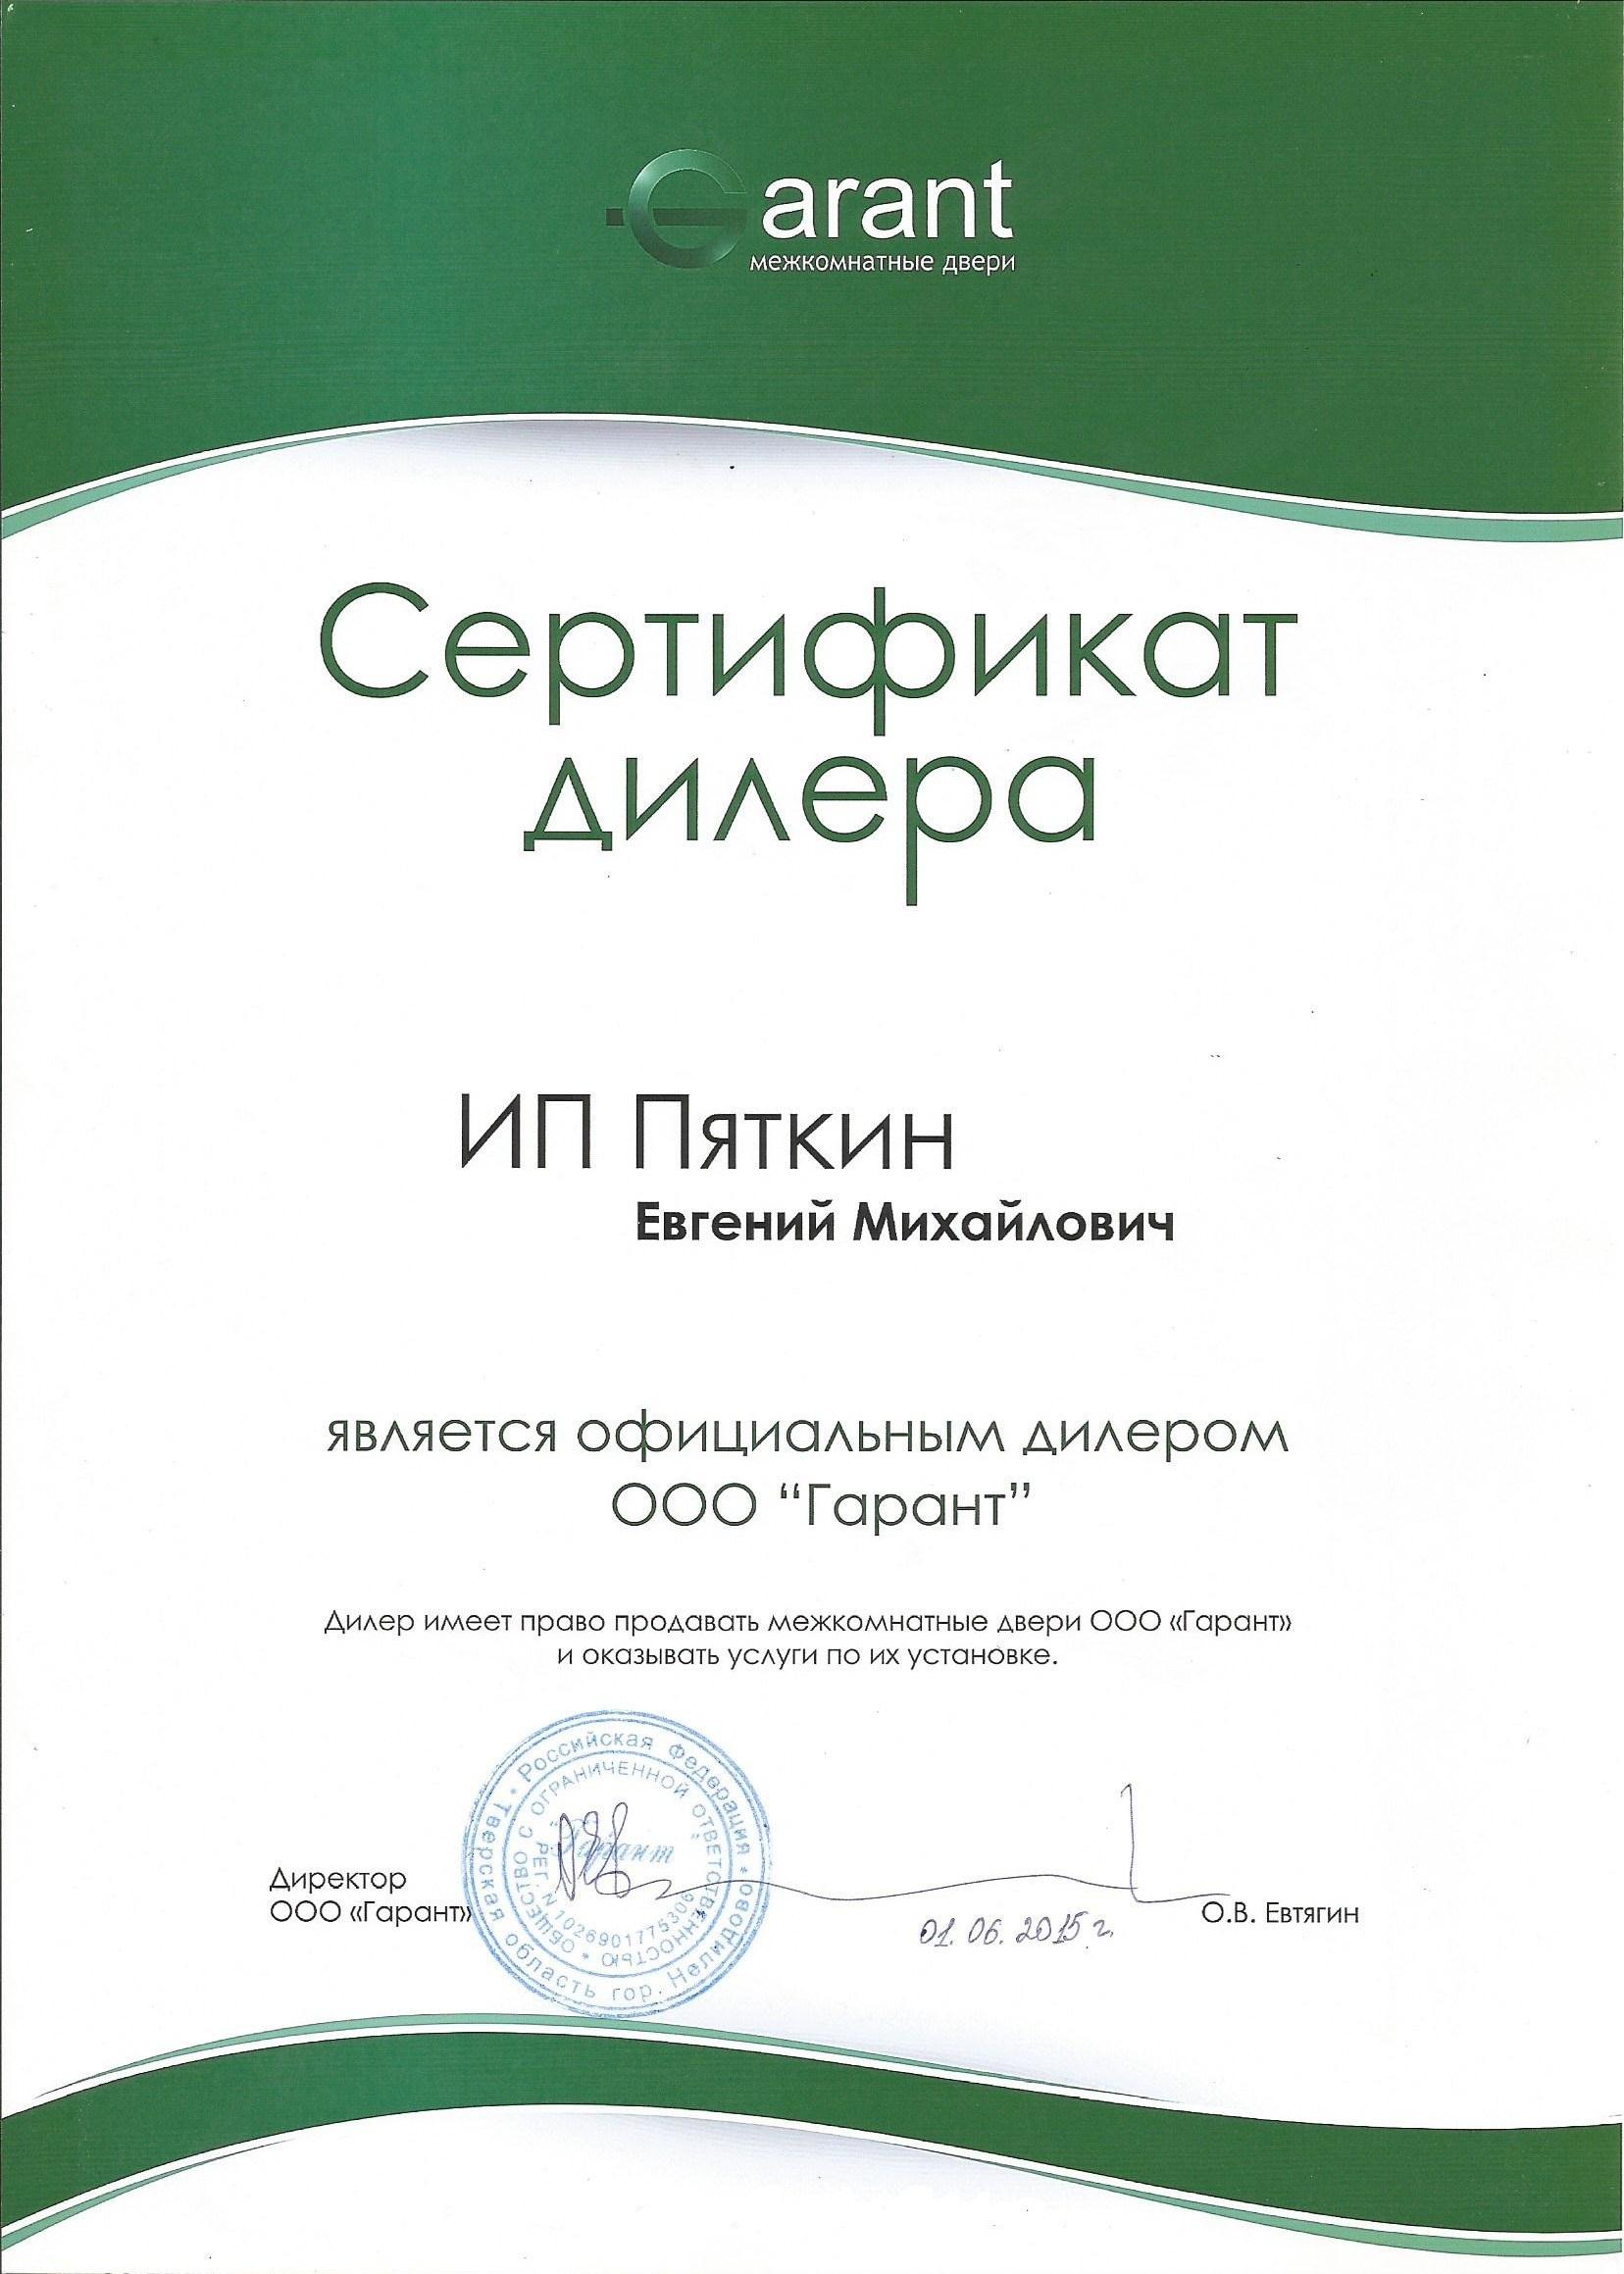 Сертификат_дилера_2_.jpg